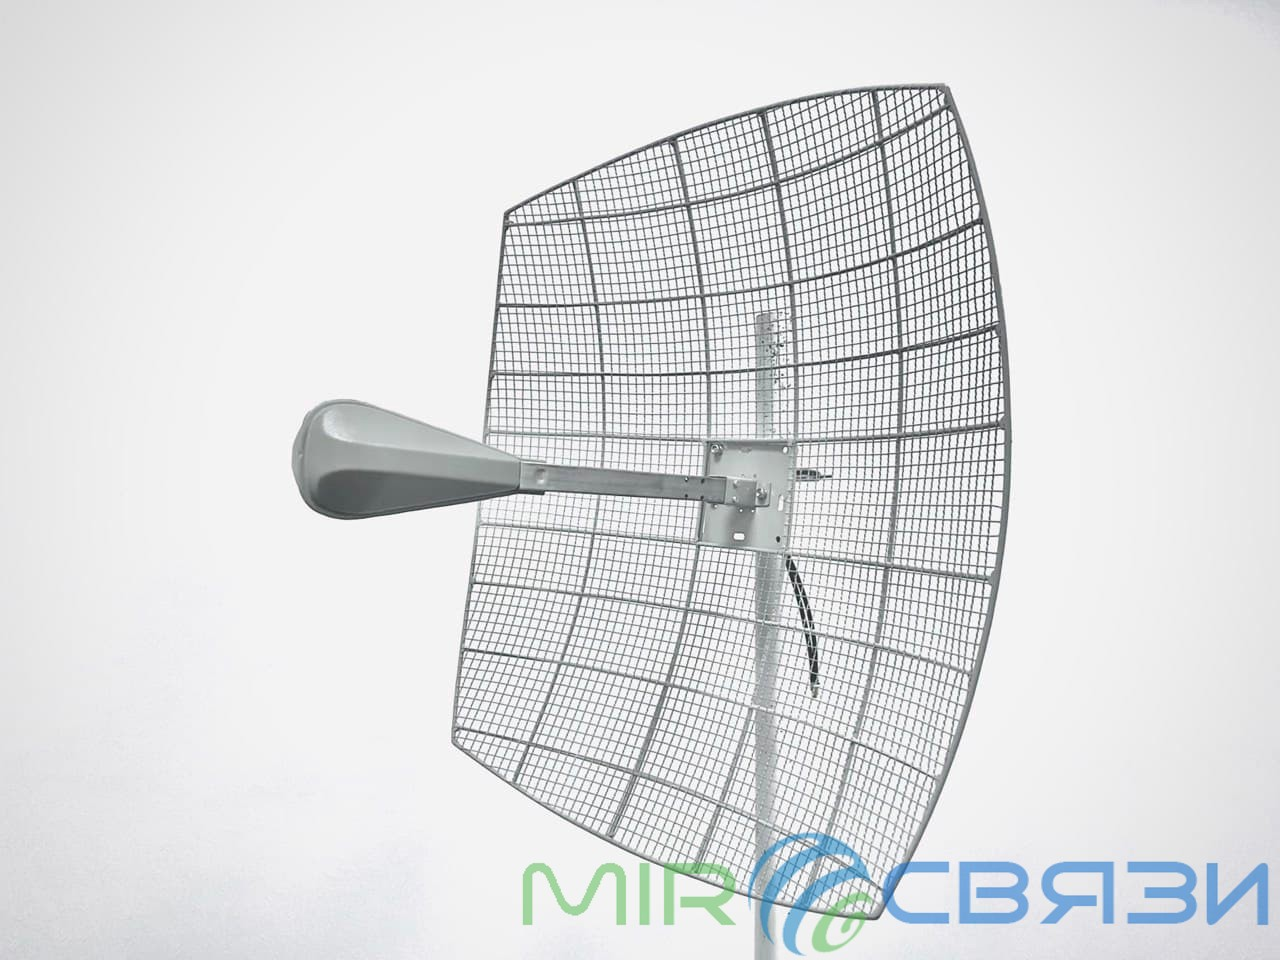 Антенна параболическая MIMO 27дБ KROKS KNA27-1700/2700 BOX с гермобоксом